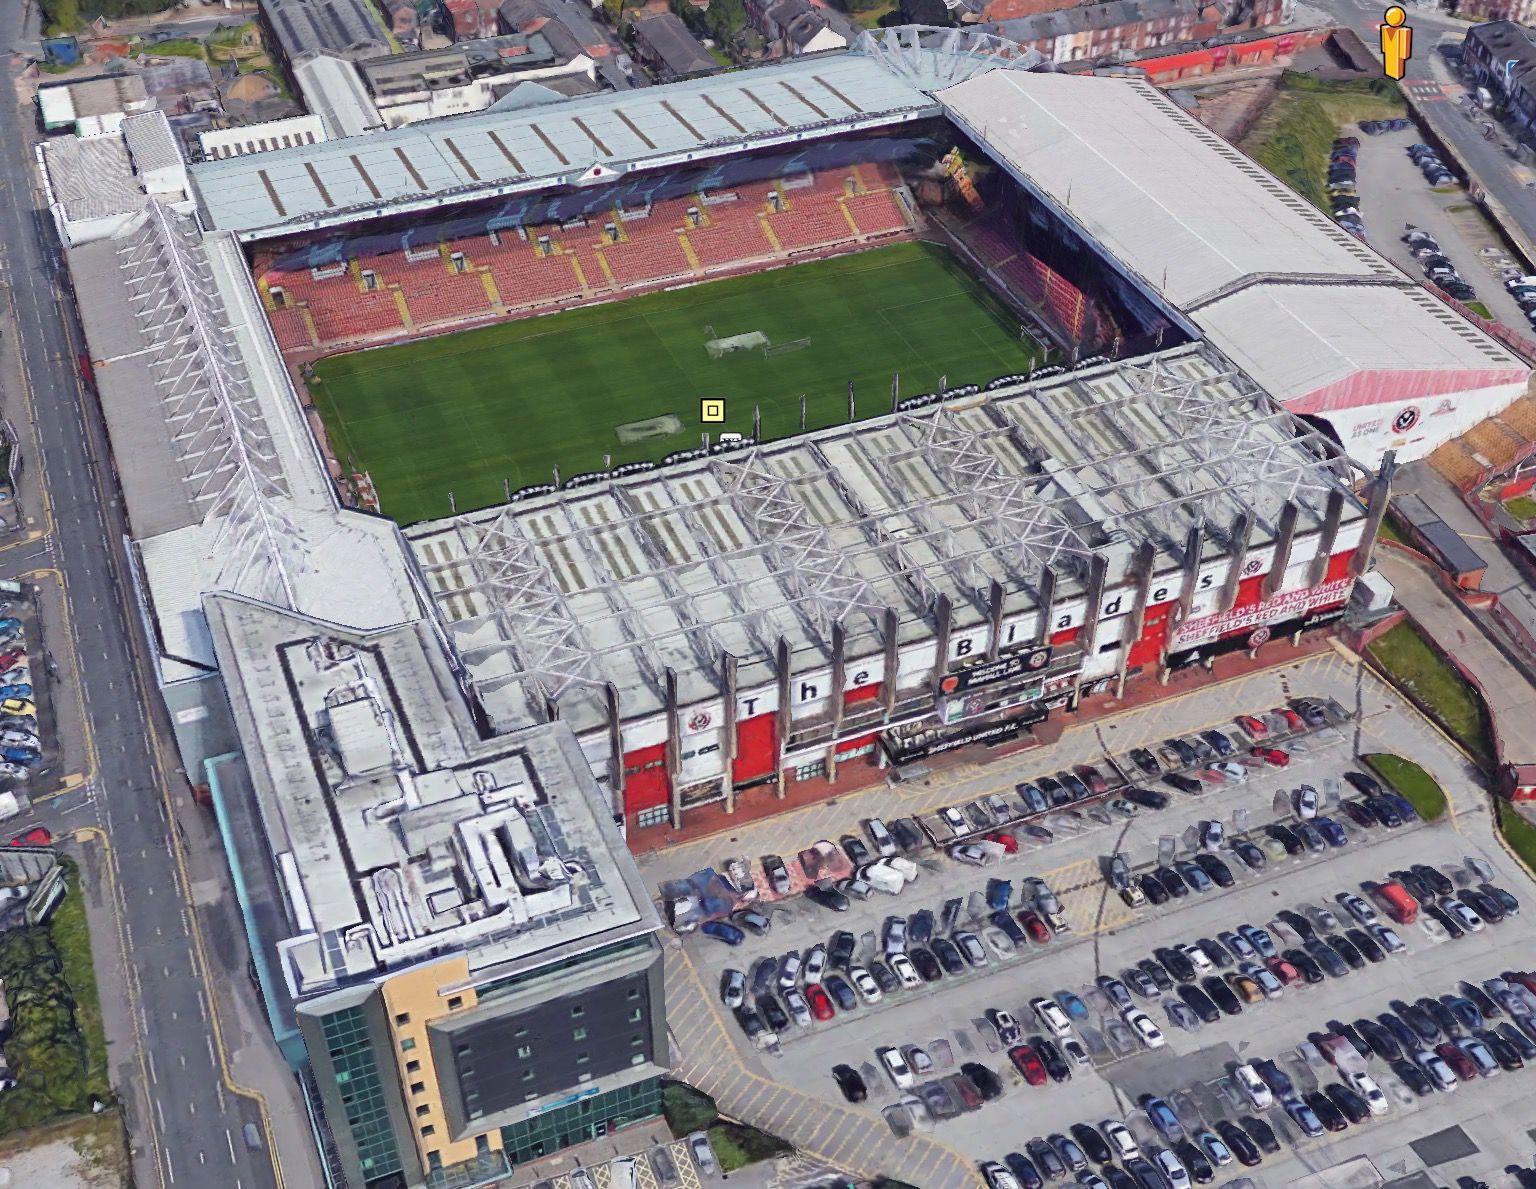 Pin on soccer stadiums